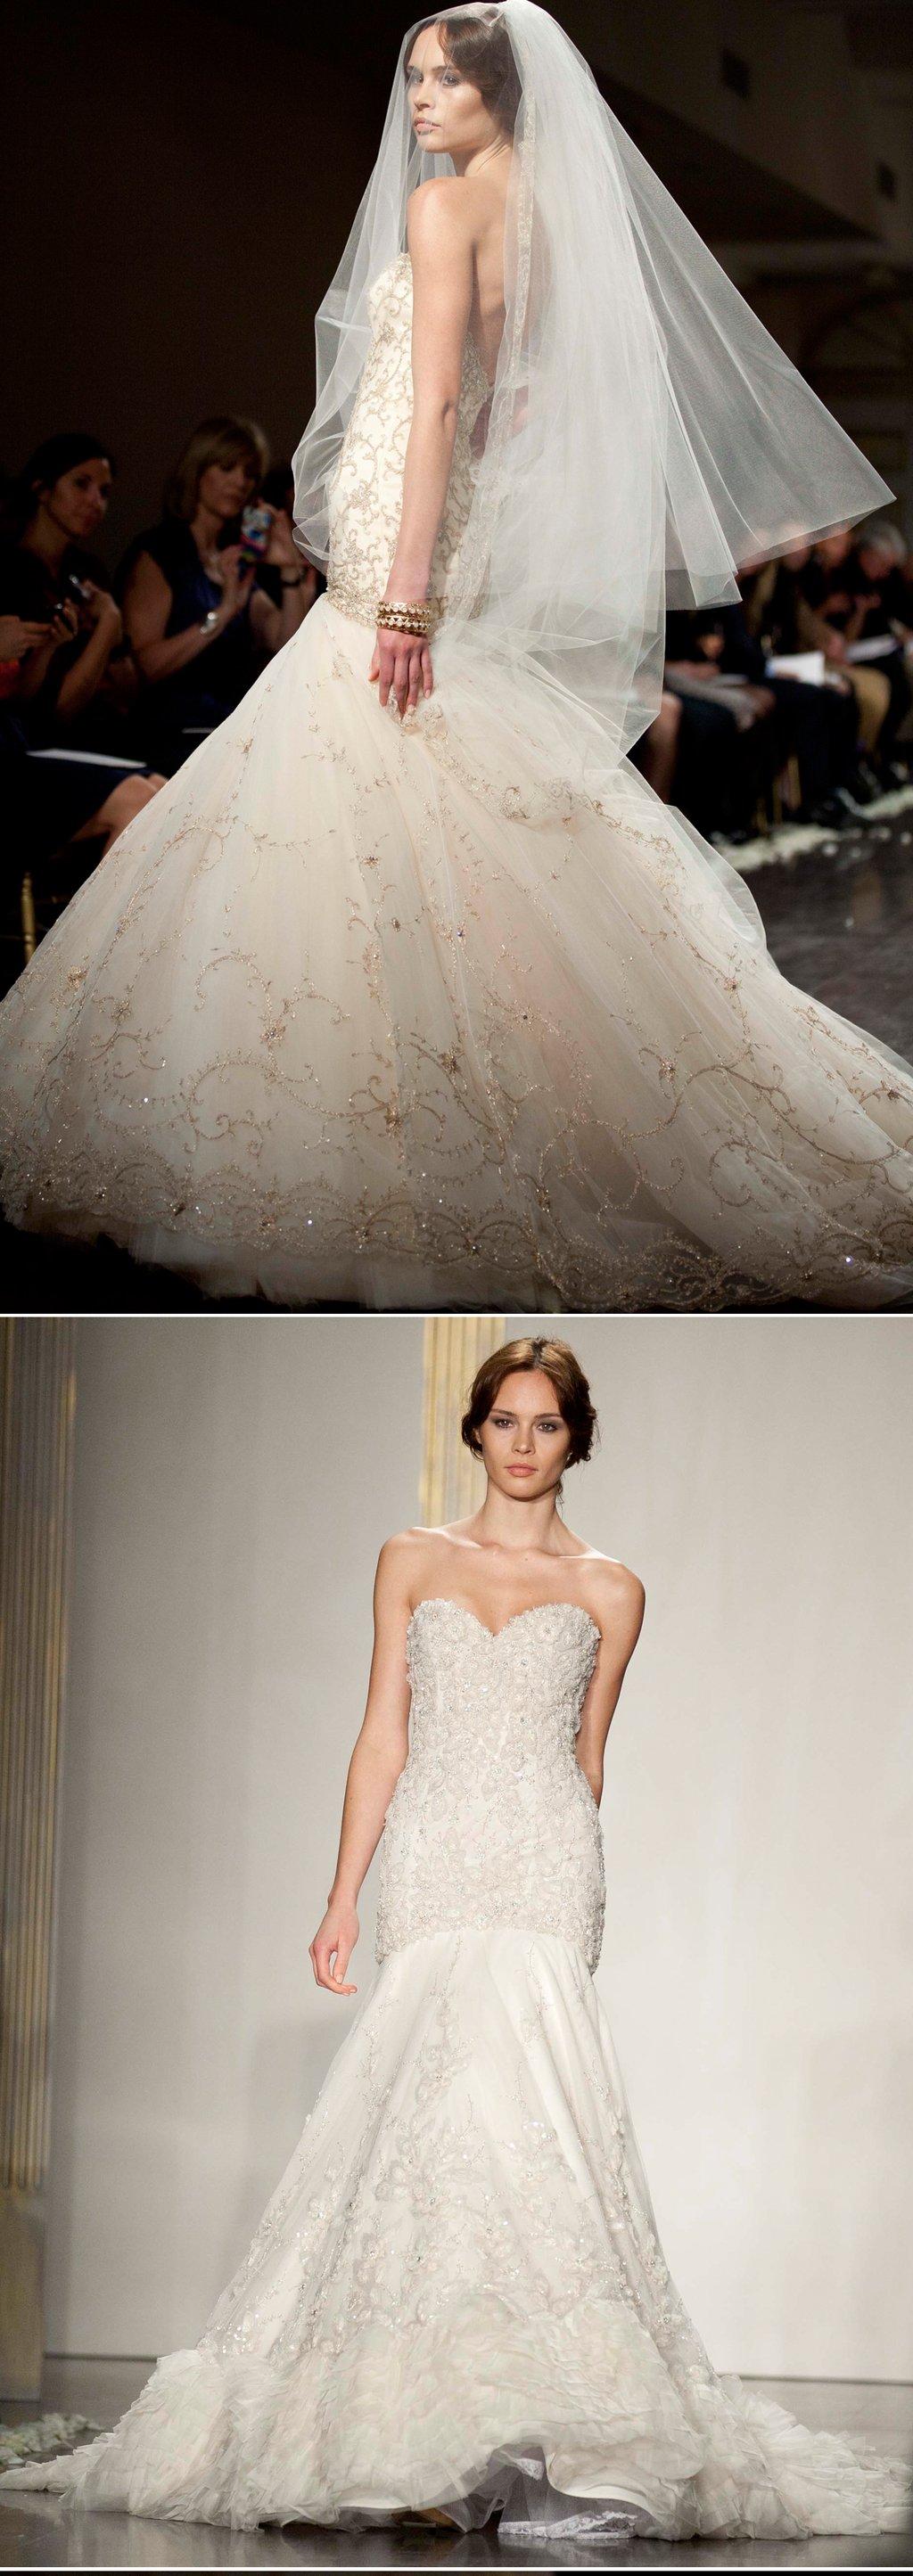 2012-mermaid-bridal-gowns-wedding-dress-beading.full